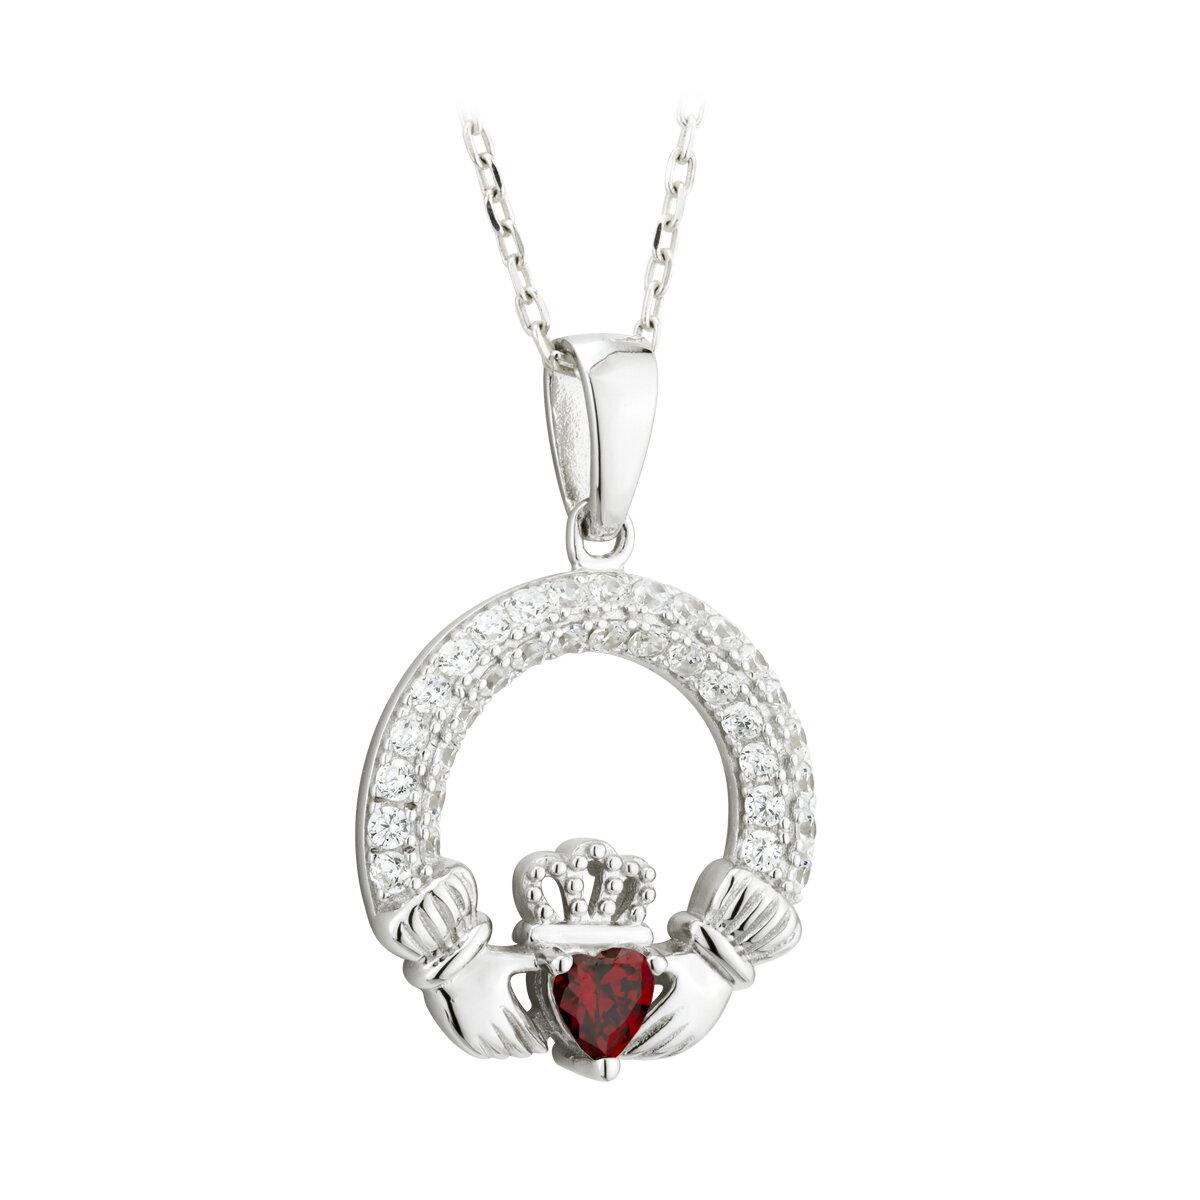 january birthstone garnet claddagh necklace S46117-01 from Solvar